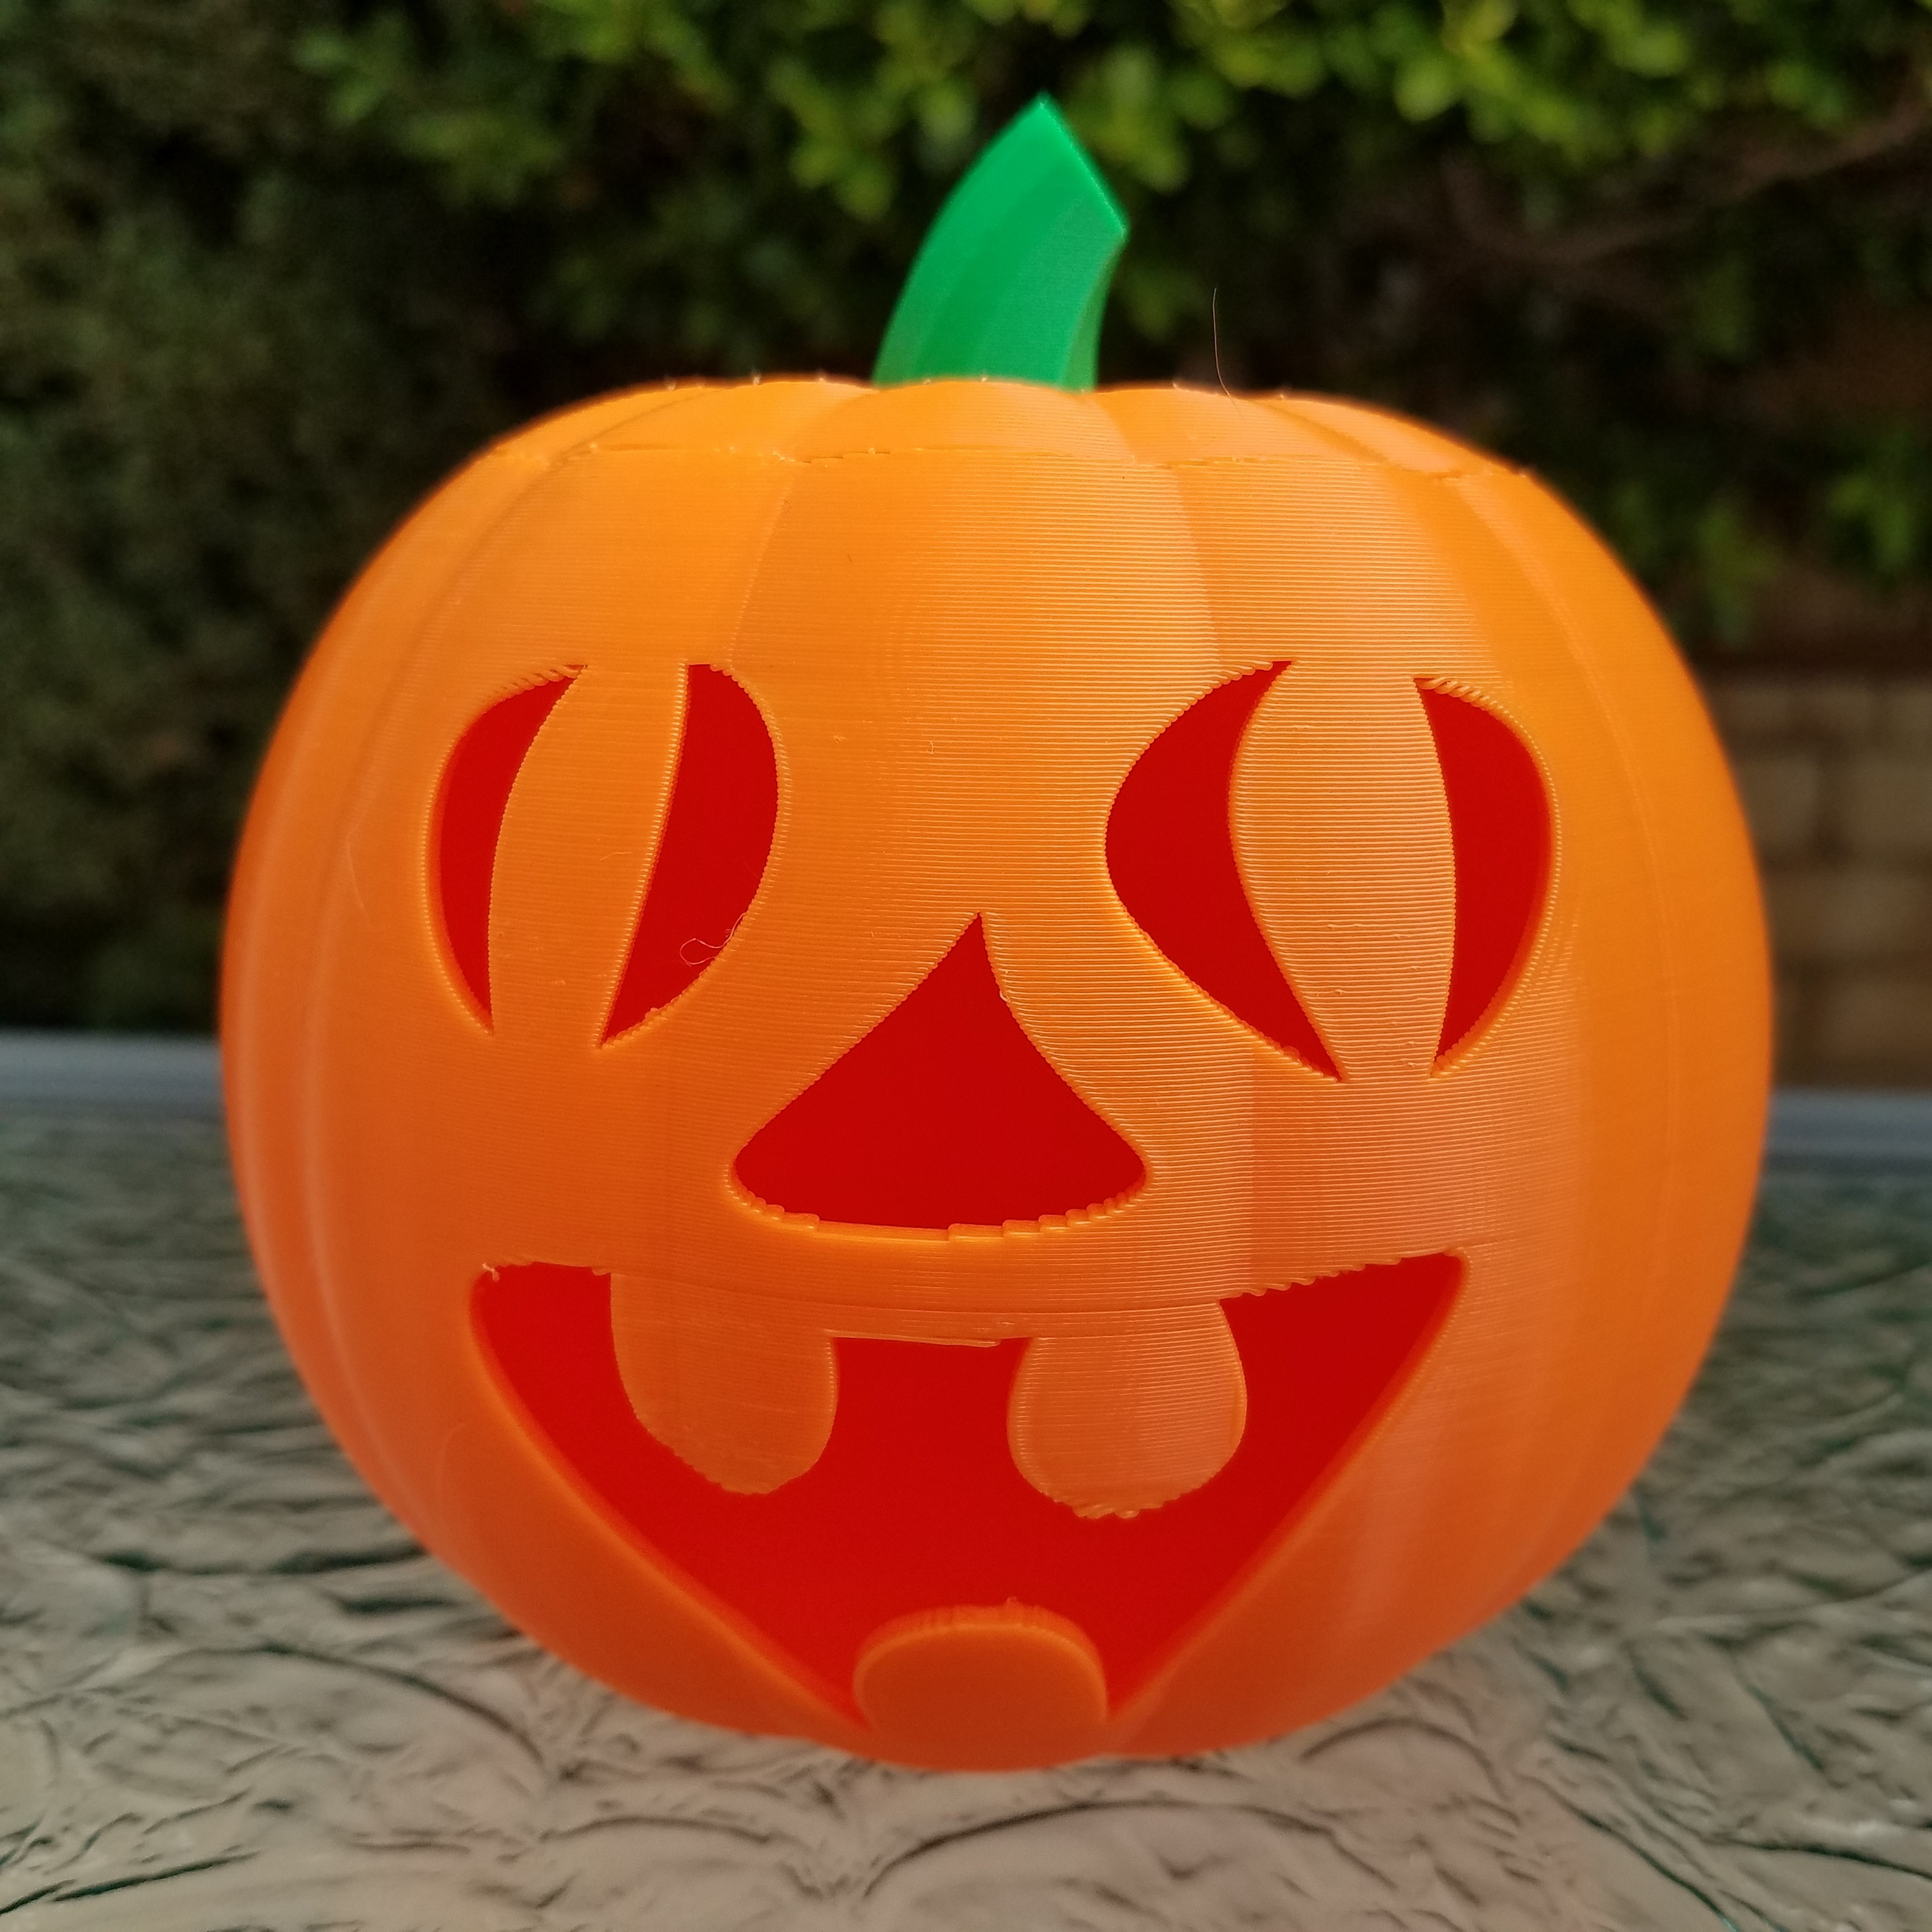 20201022_101700.jpg Download STL file Jack-O'-Lantern Funny Face • 3D printable design, abbymath